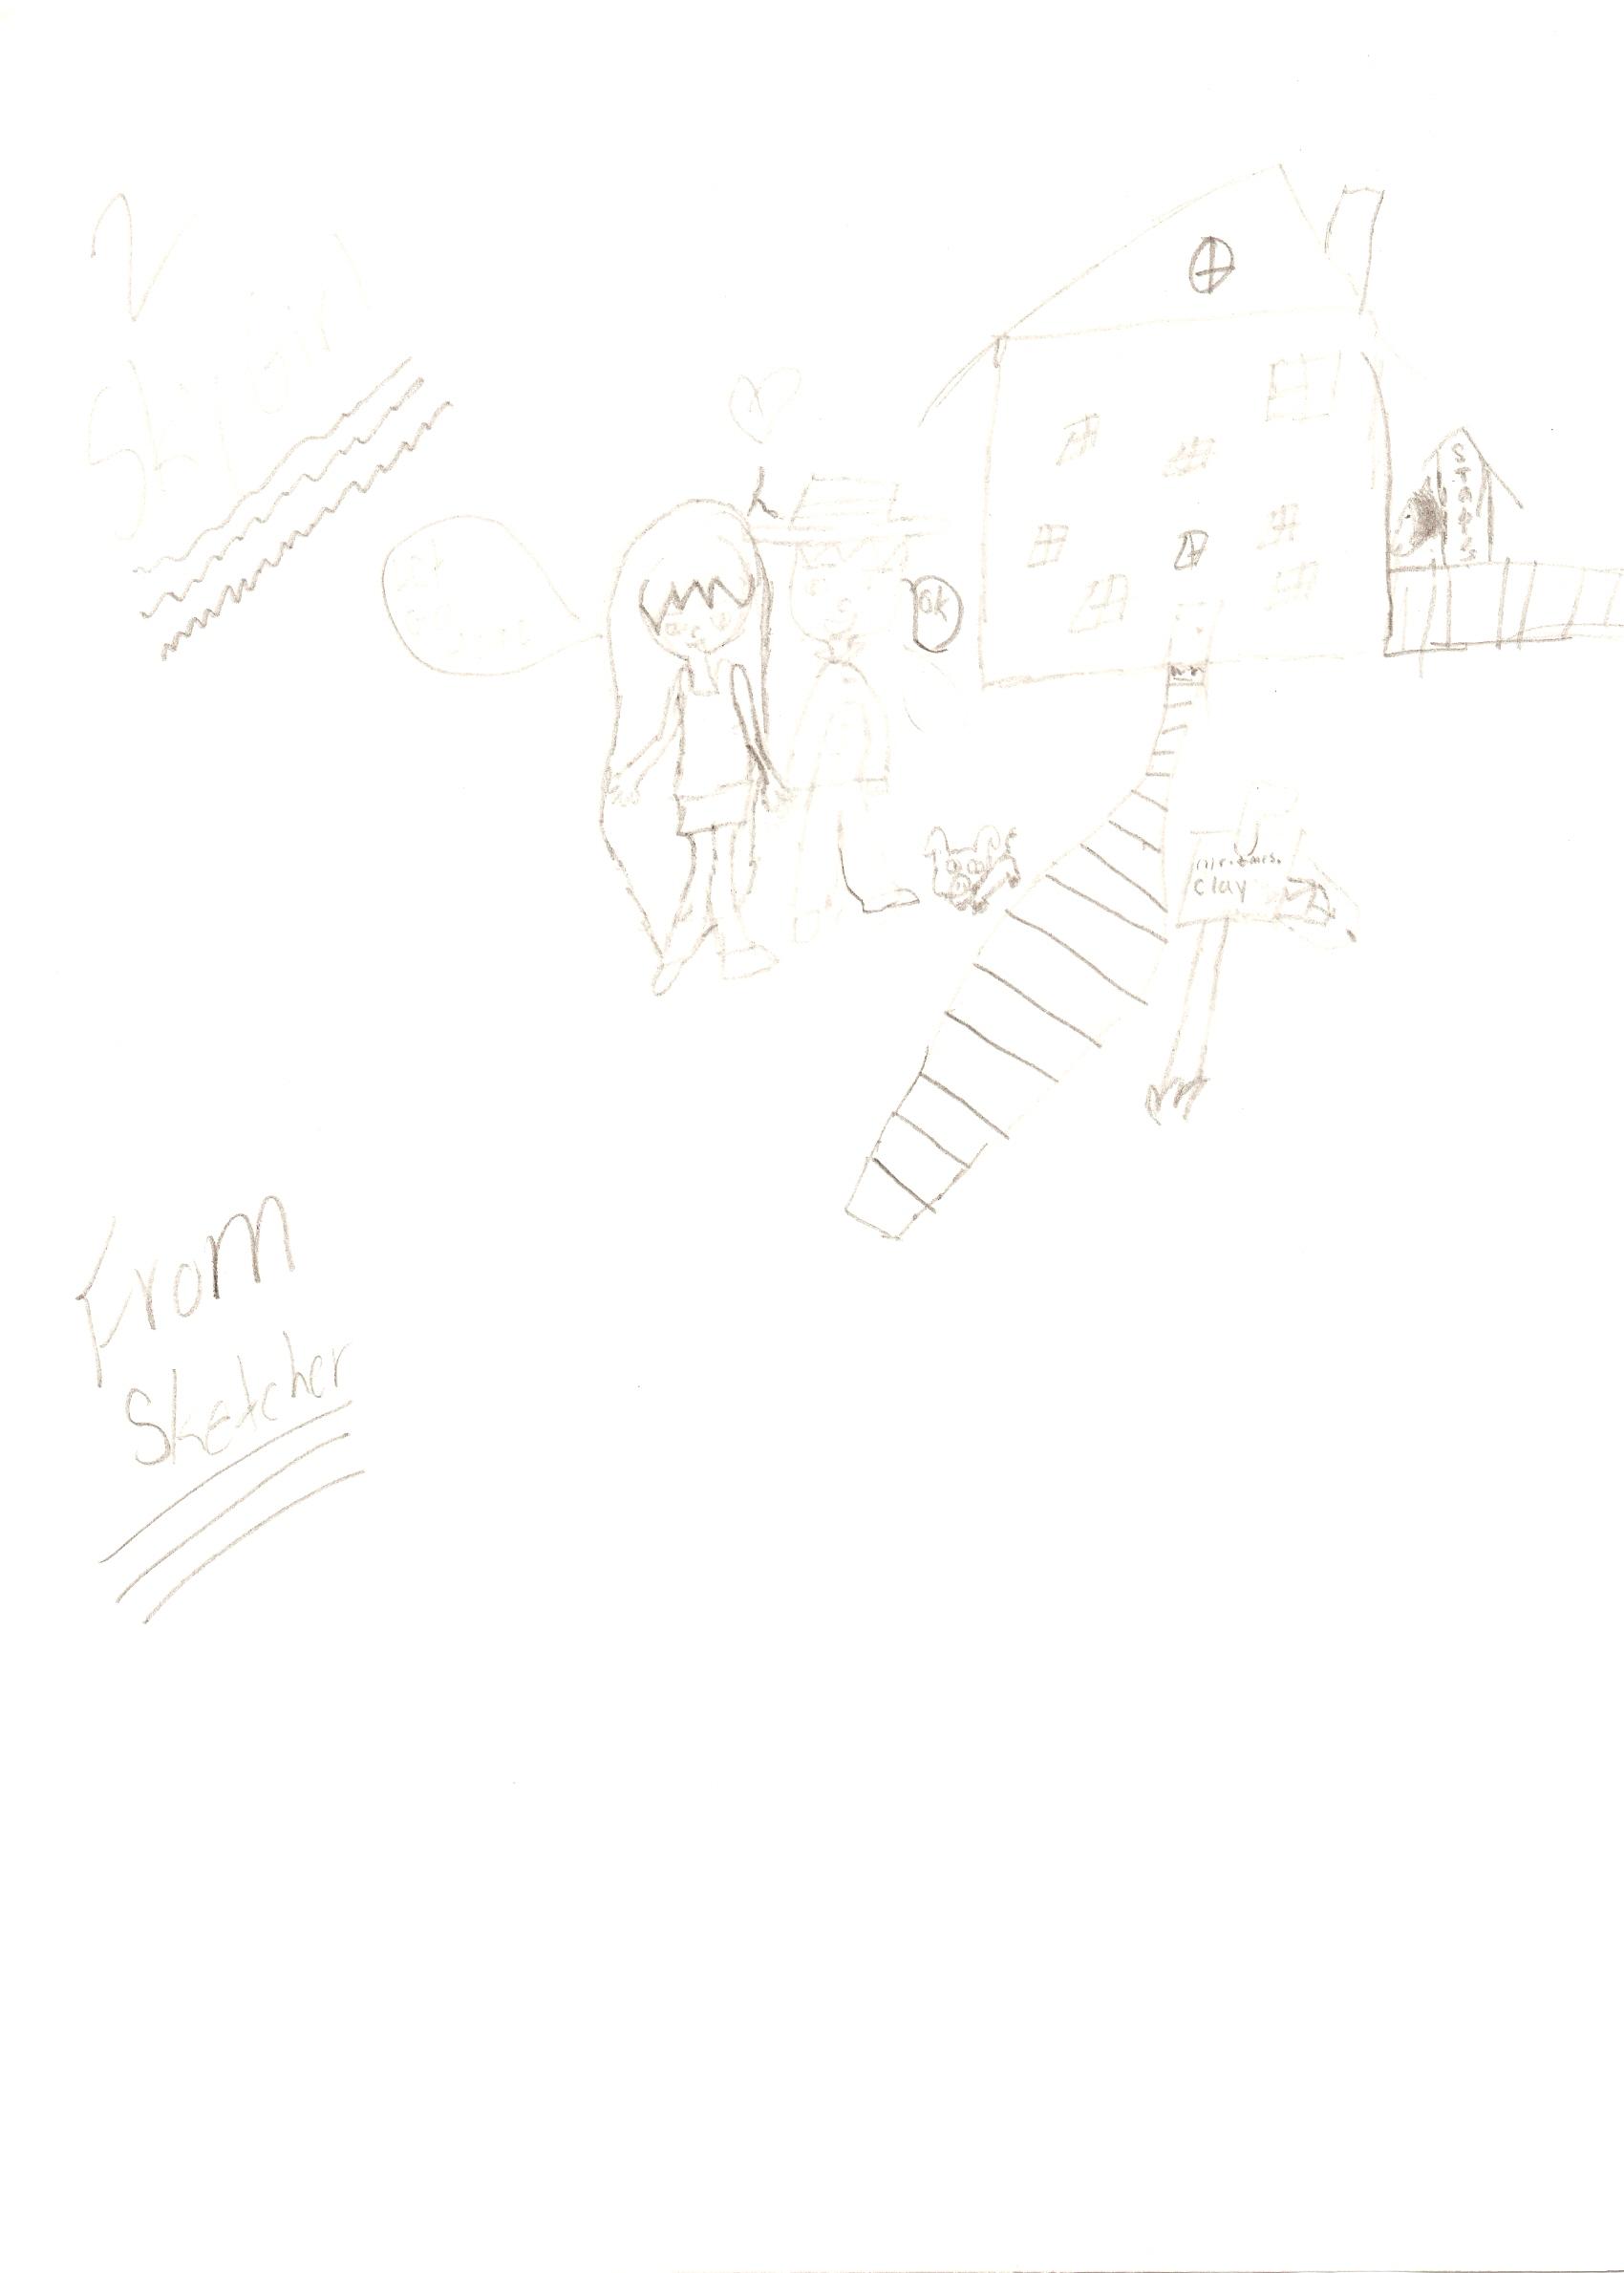 Skygirl by sketcher36